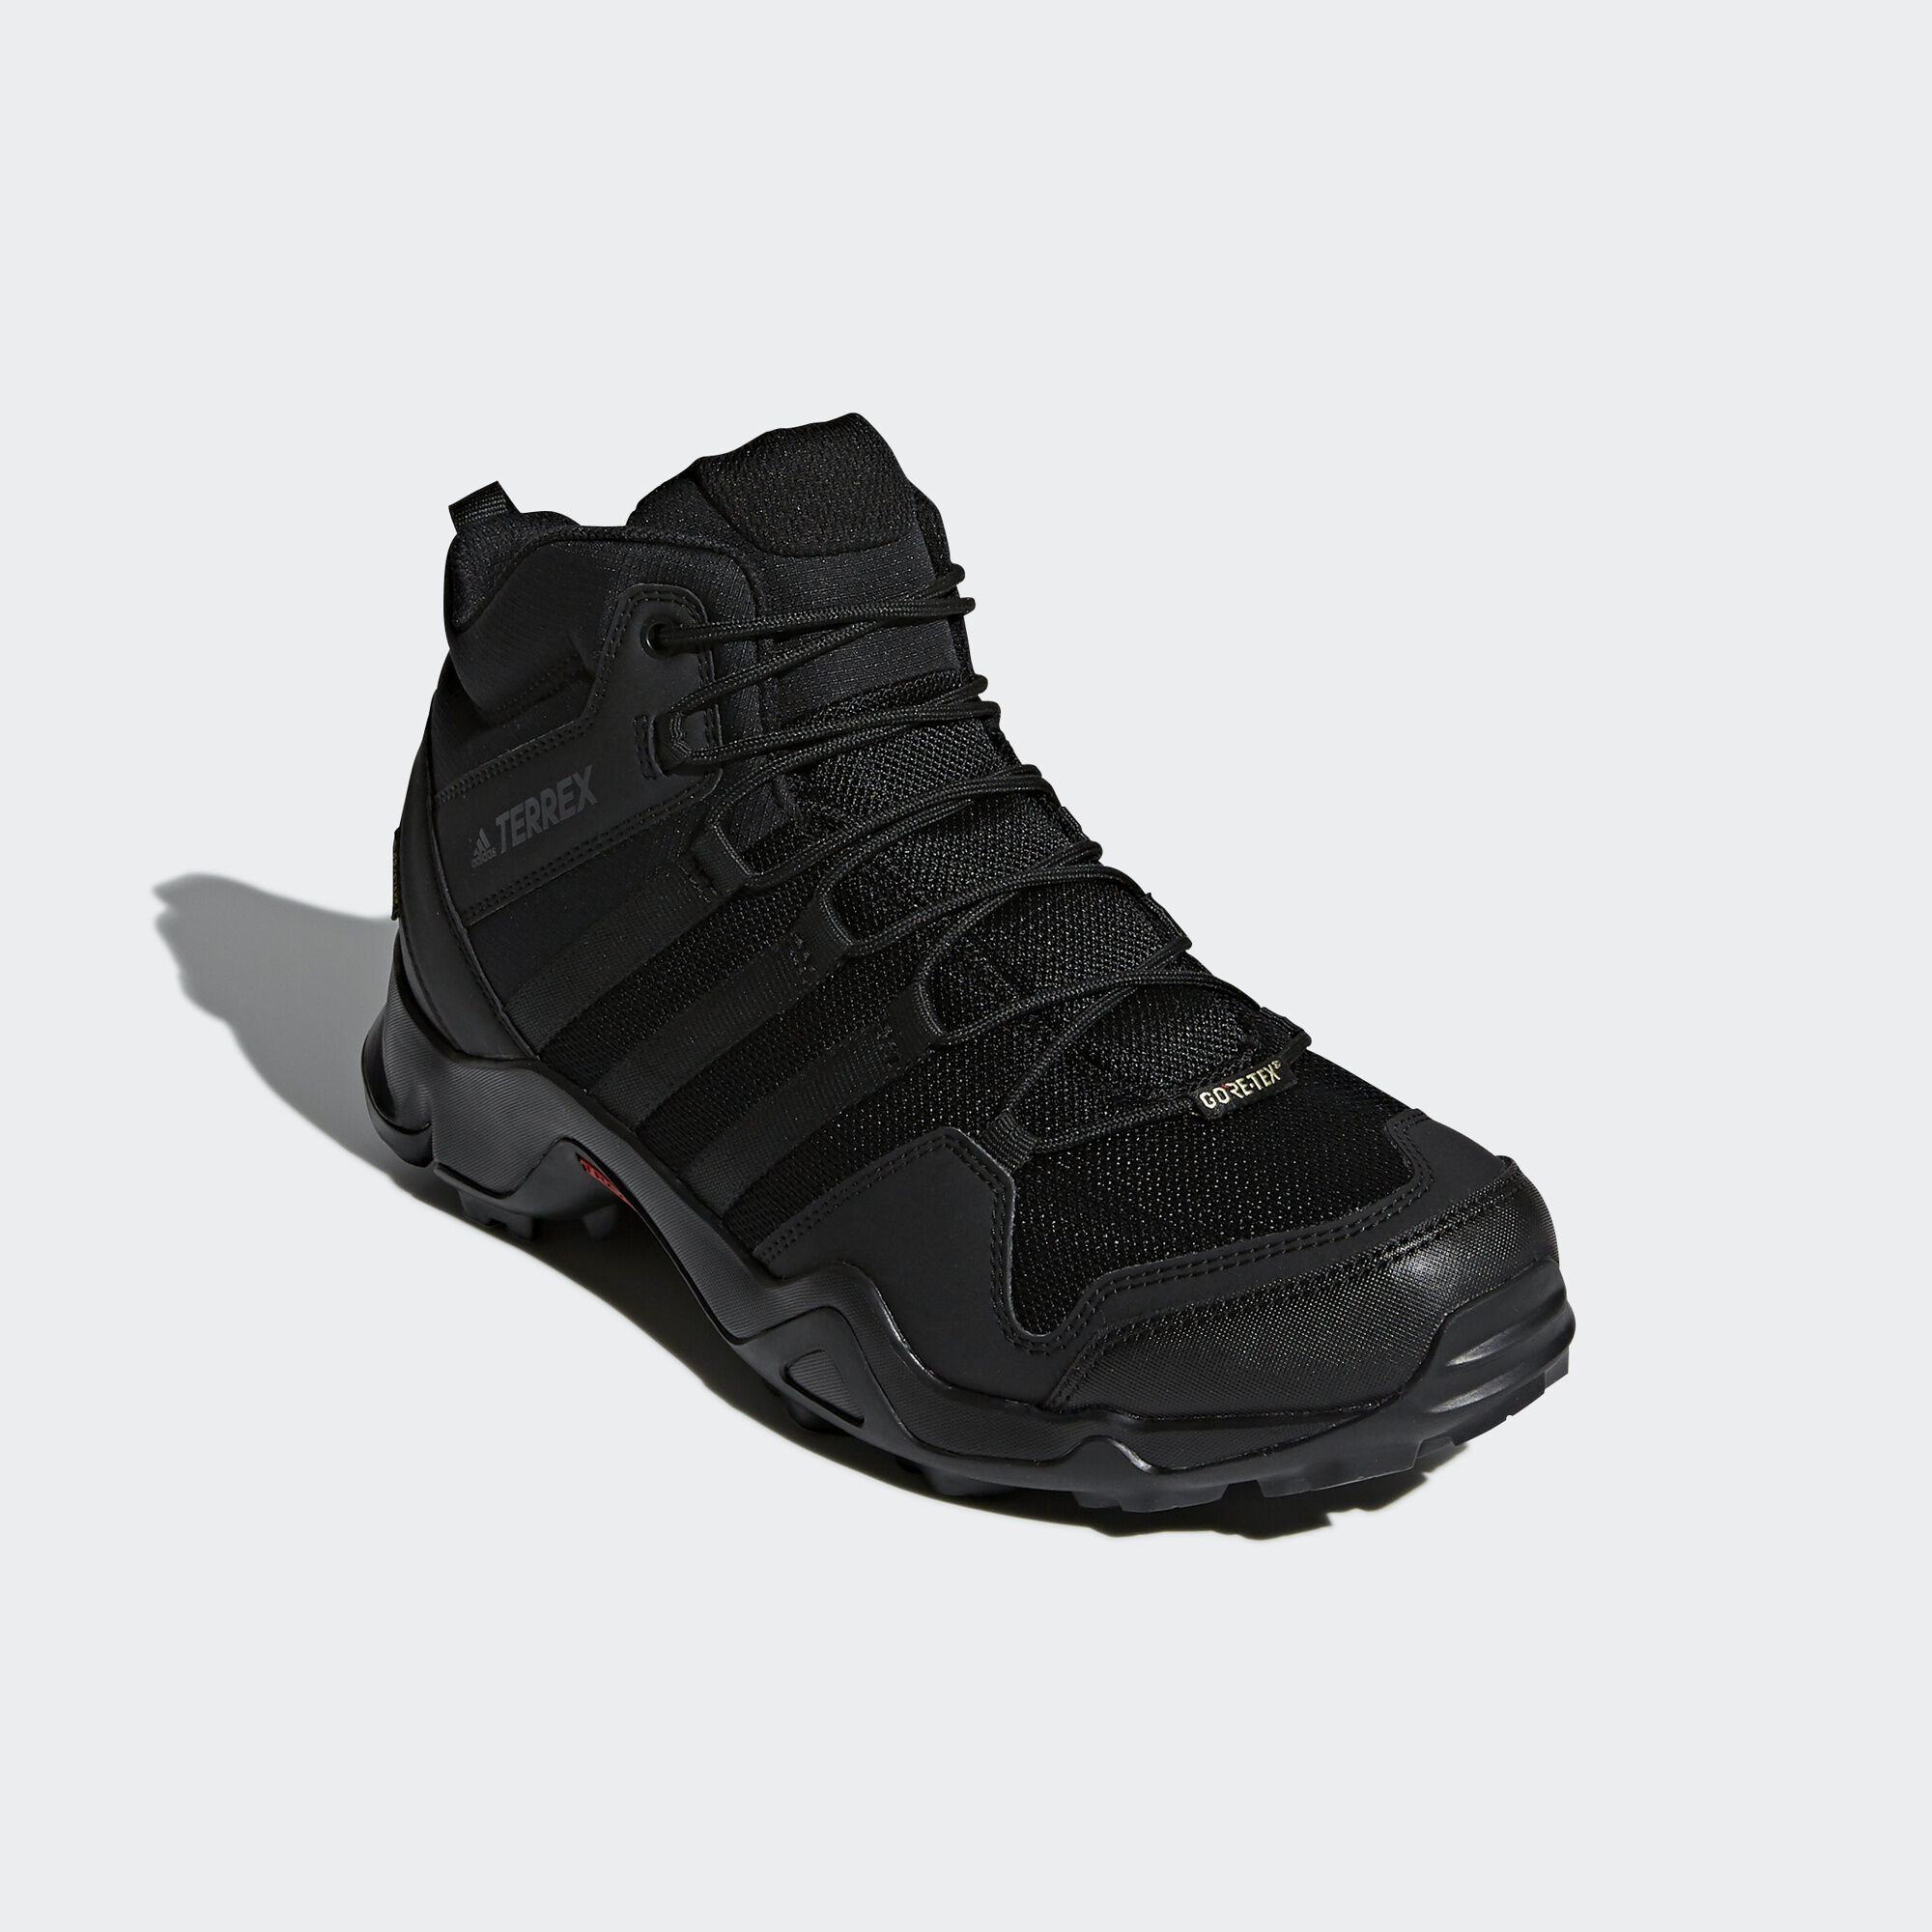 save off 3bd22 e7f34 Terrex AX2R Mid GTX Shoes